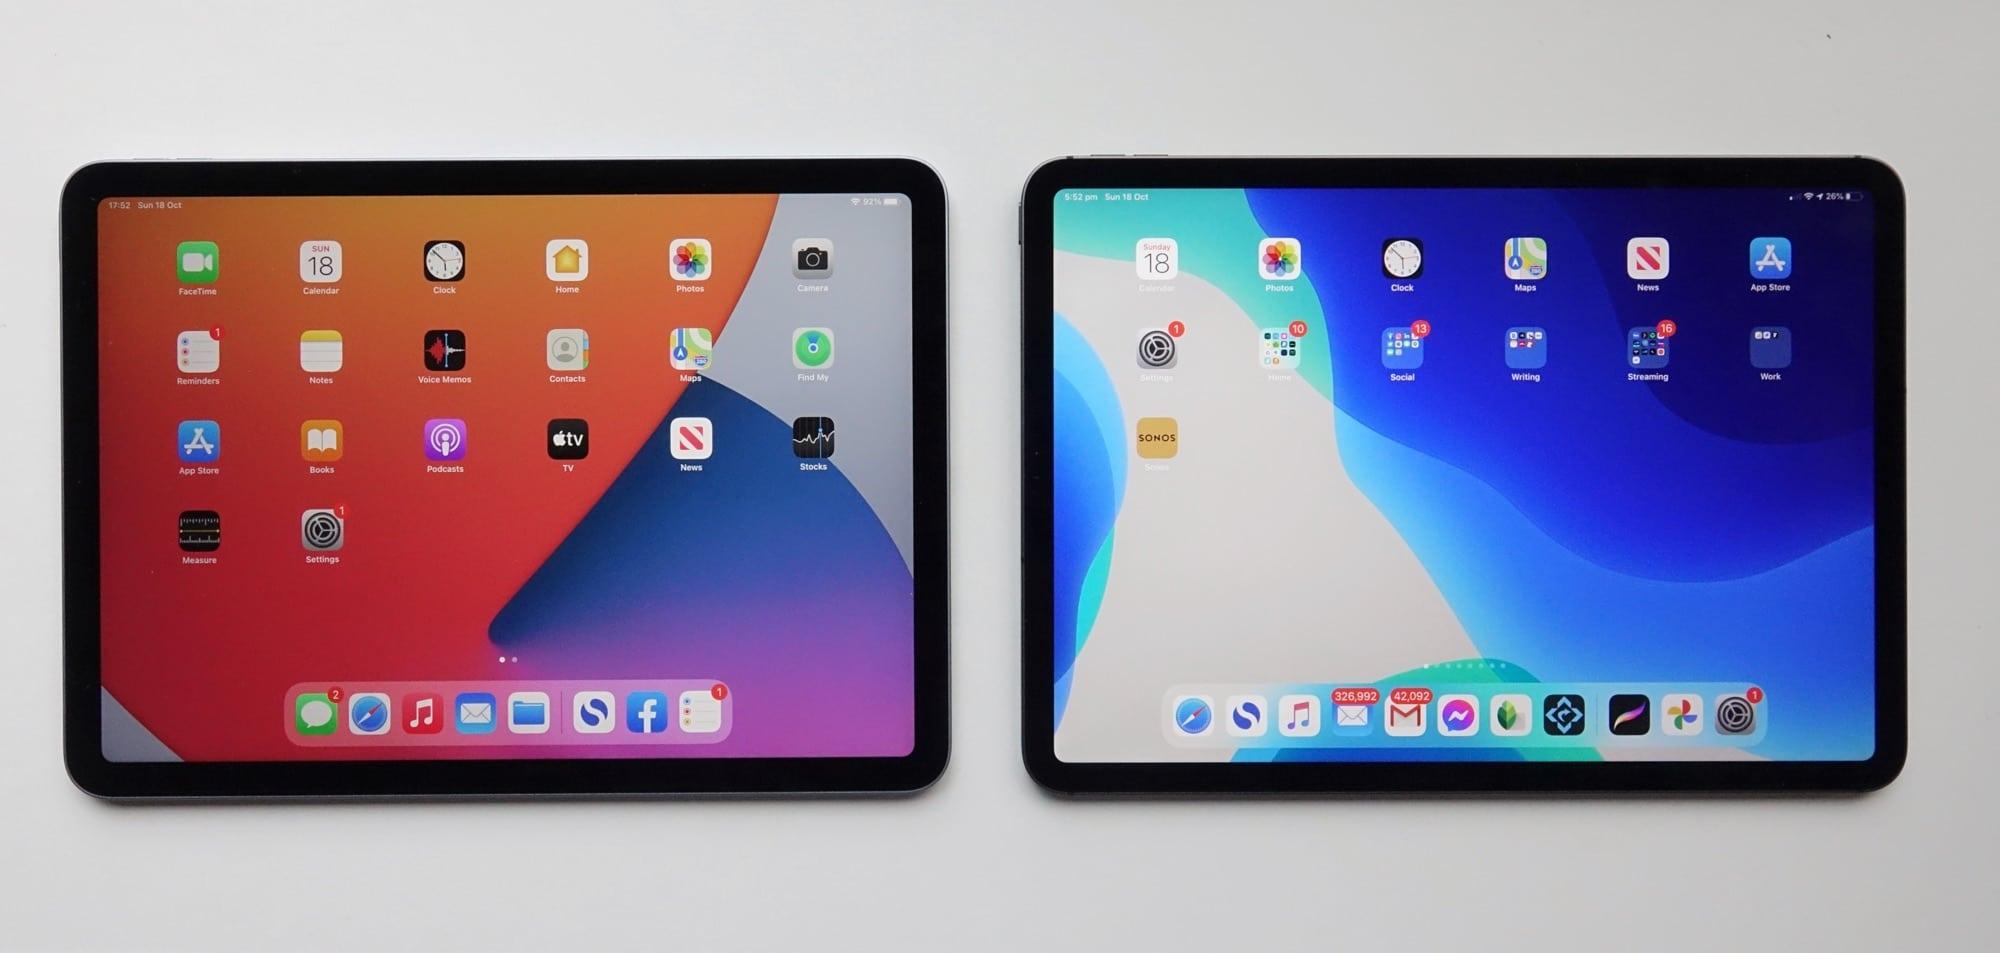 Apple iPad Air (left) vs Apple iPad Pro (right)